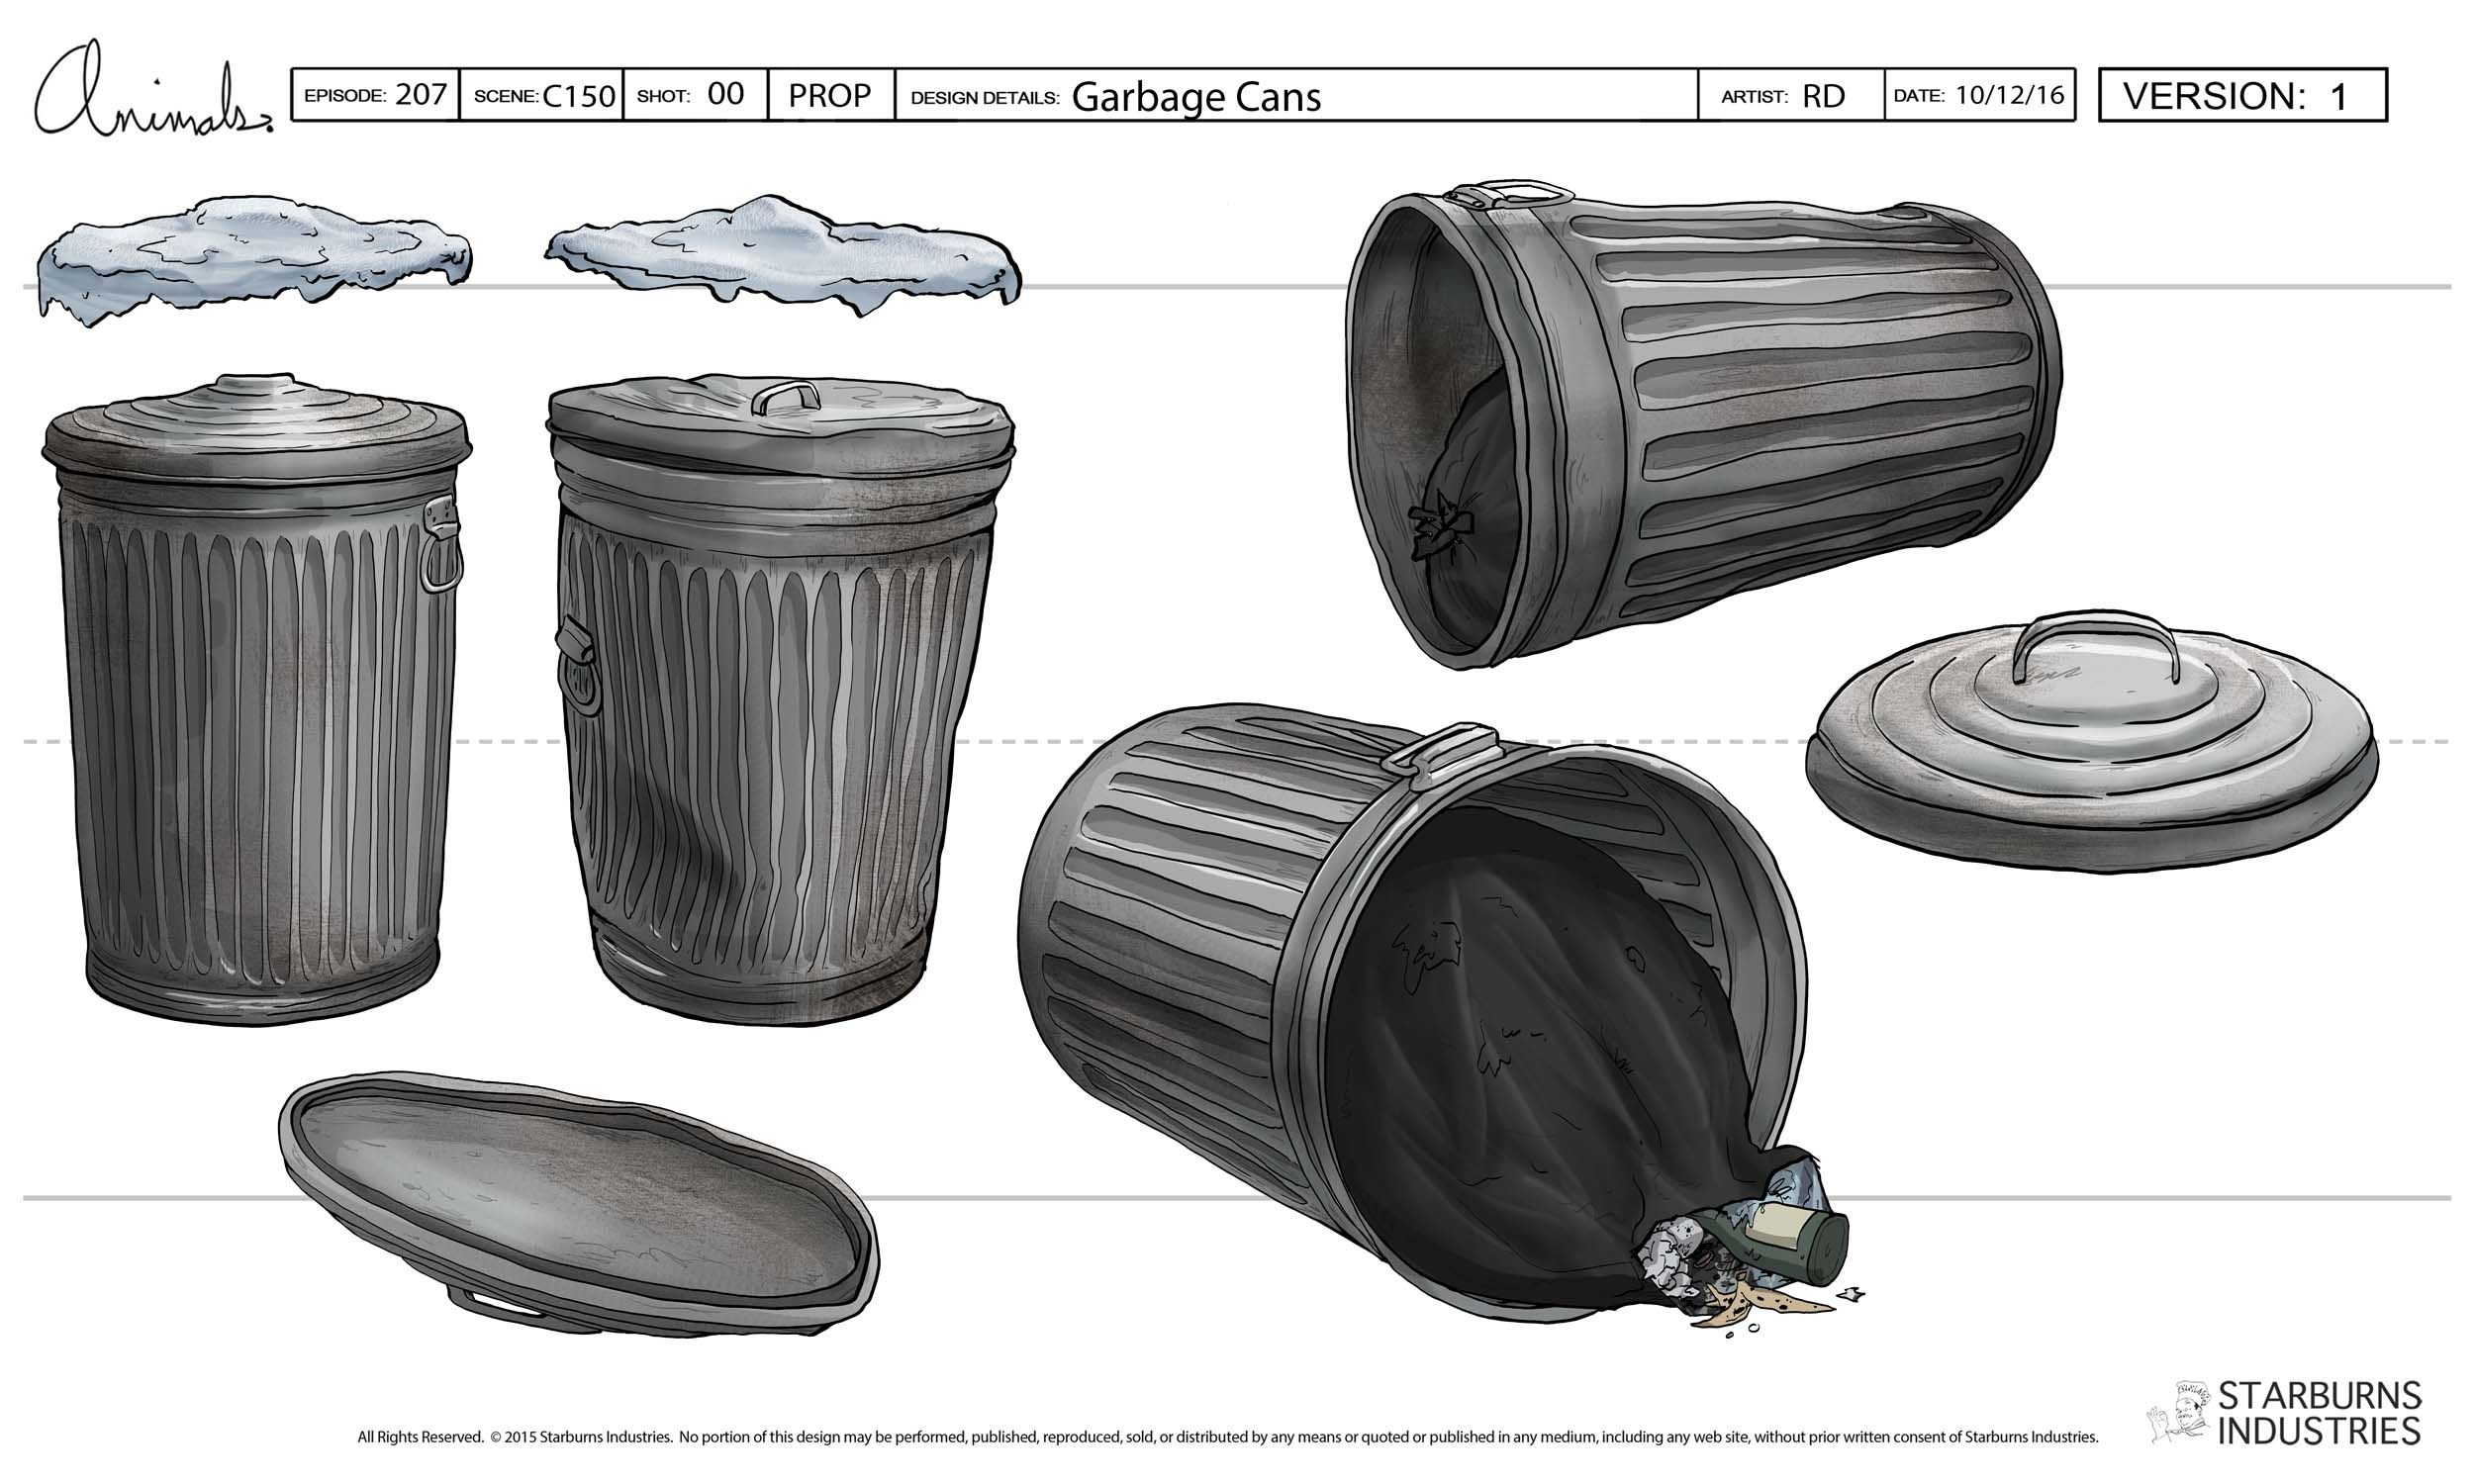 AML_207_PR_ScC150_GarbageCans_Color_V1_WY.jpg